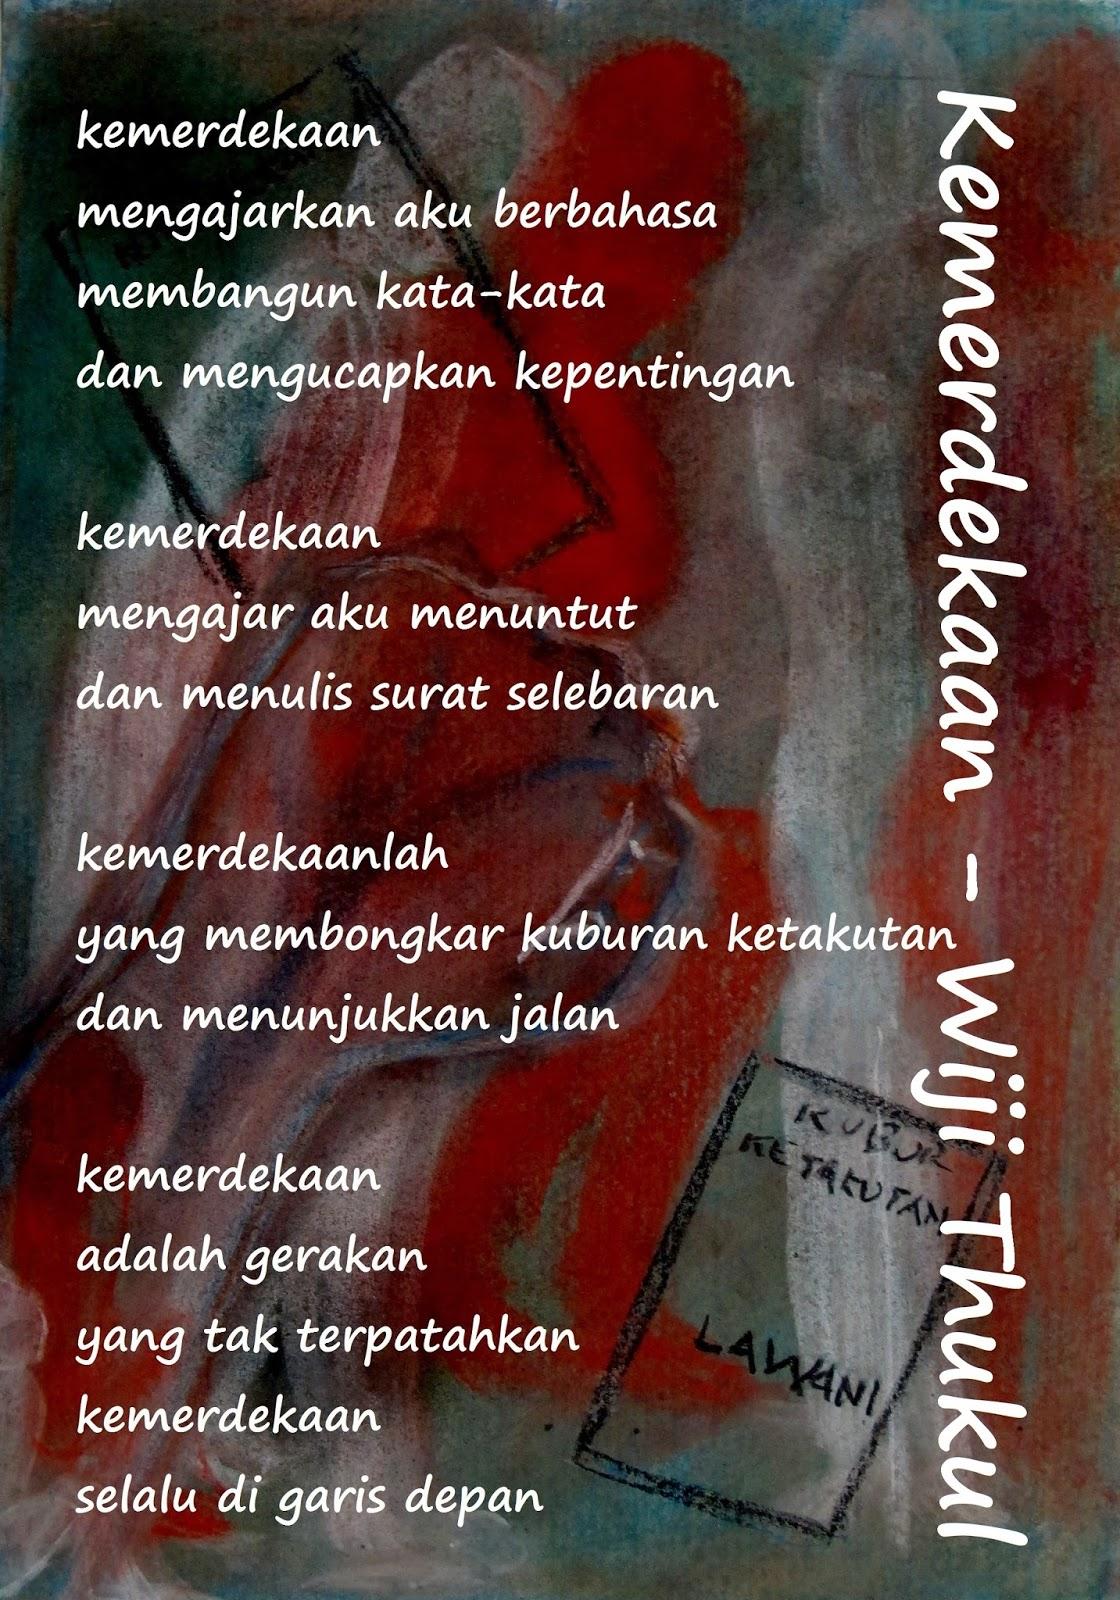 Kemerdekaan Puisi Puisi Wiji Thukul 32 Monumen Peringatan Wiji